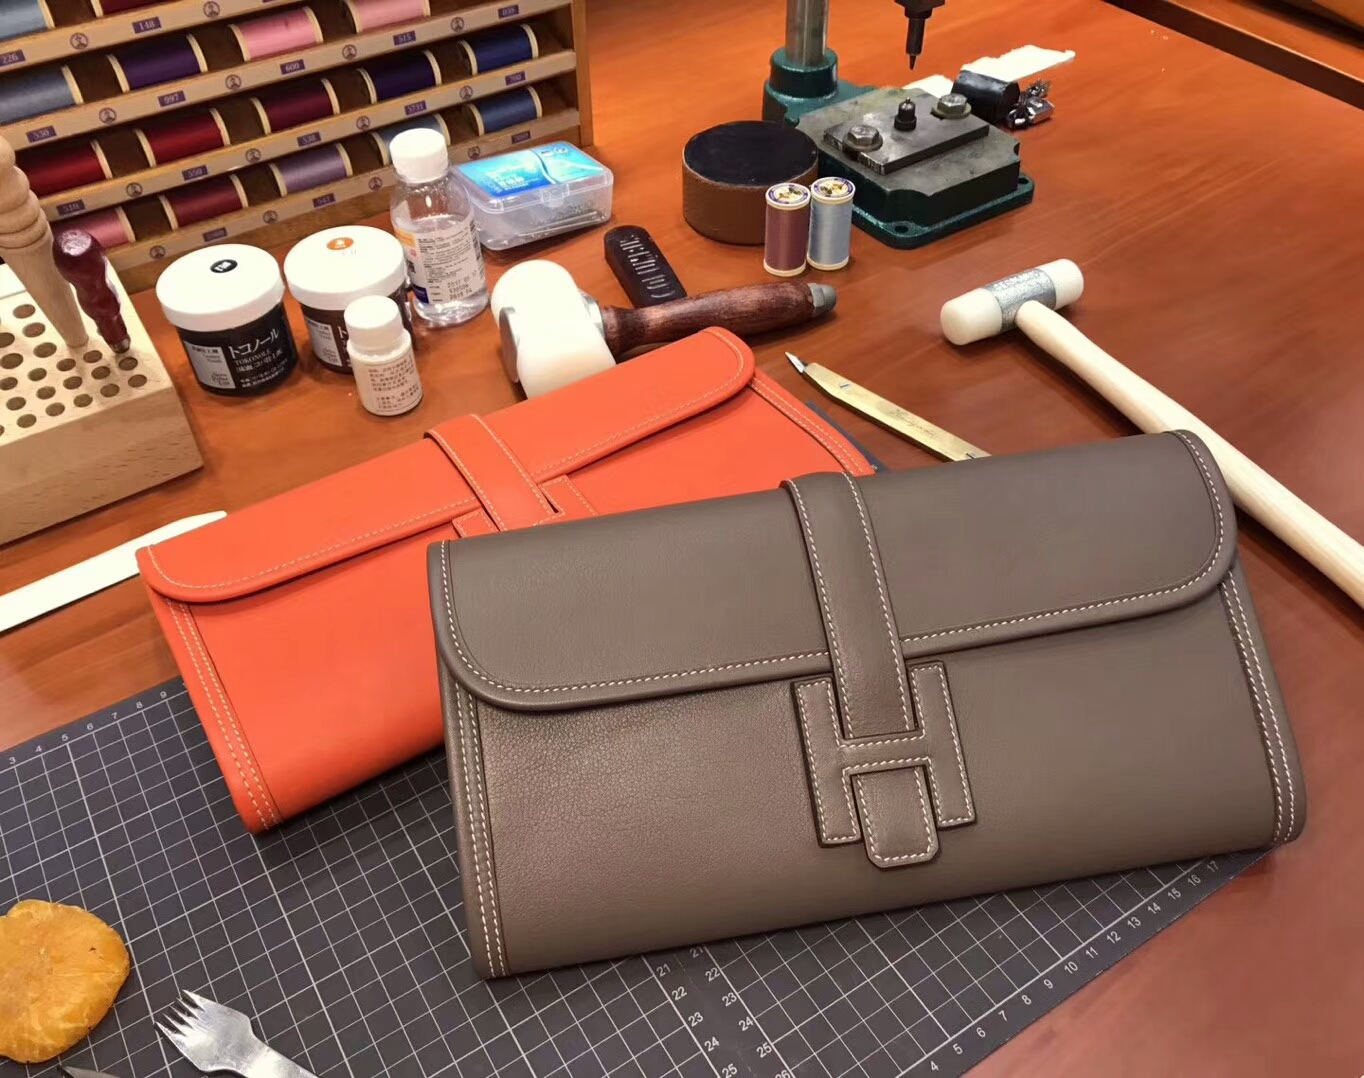 HERMES 爱马仕 手包 配全套专柜原版包装 全球发售 4g brulee 焦糖色